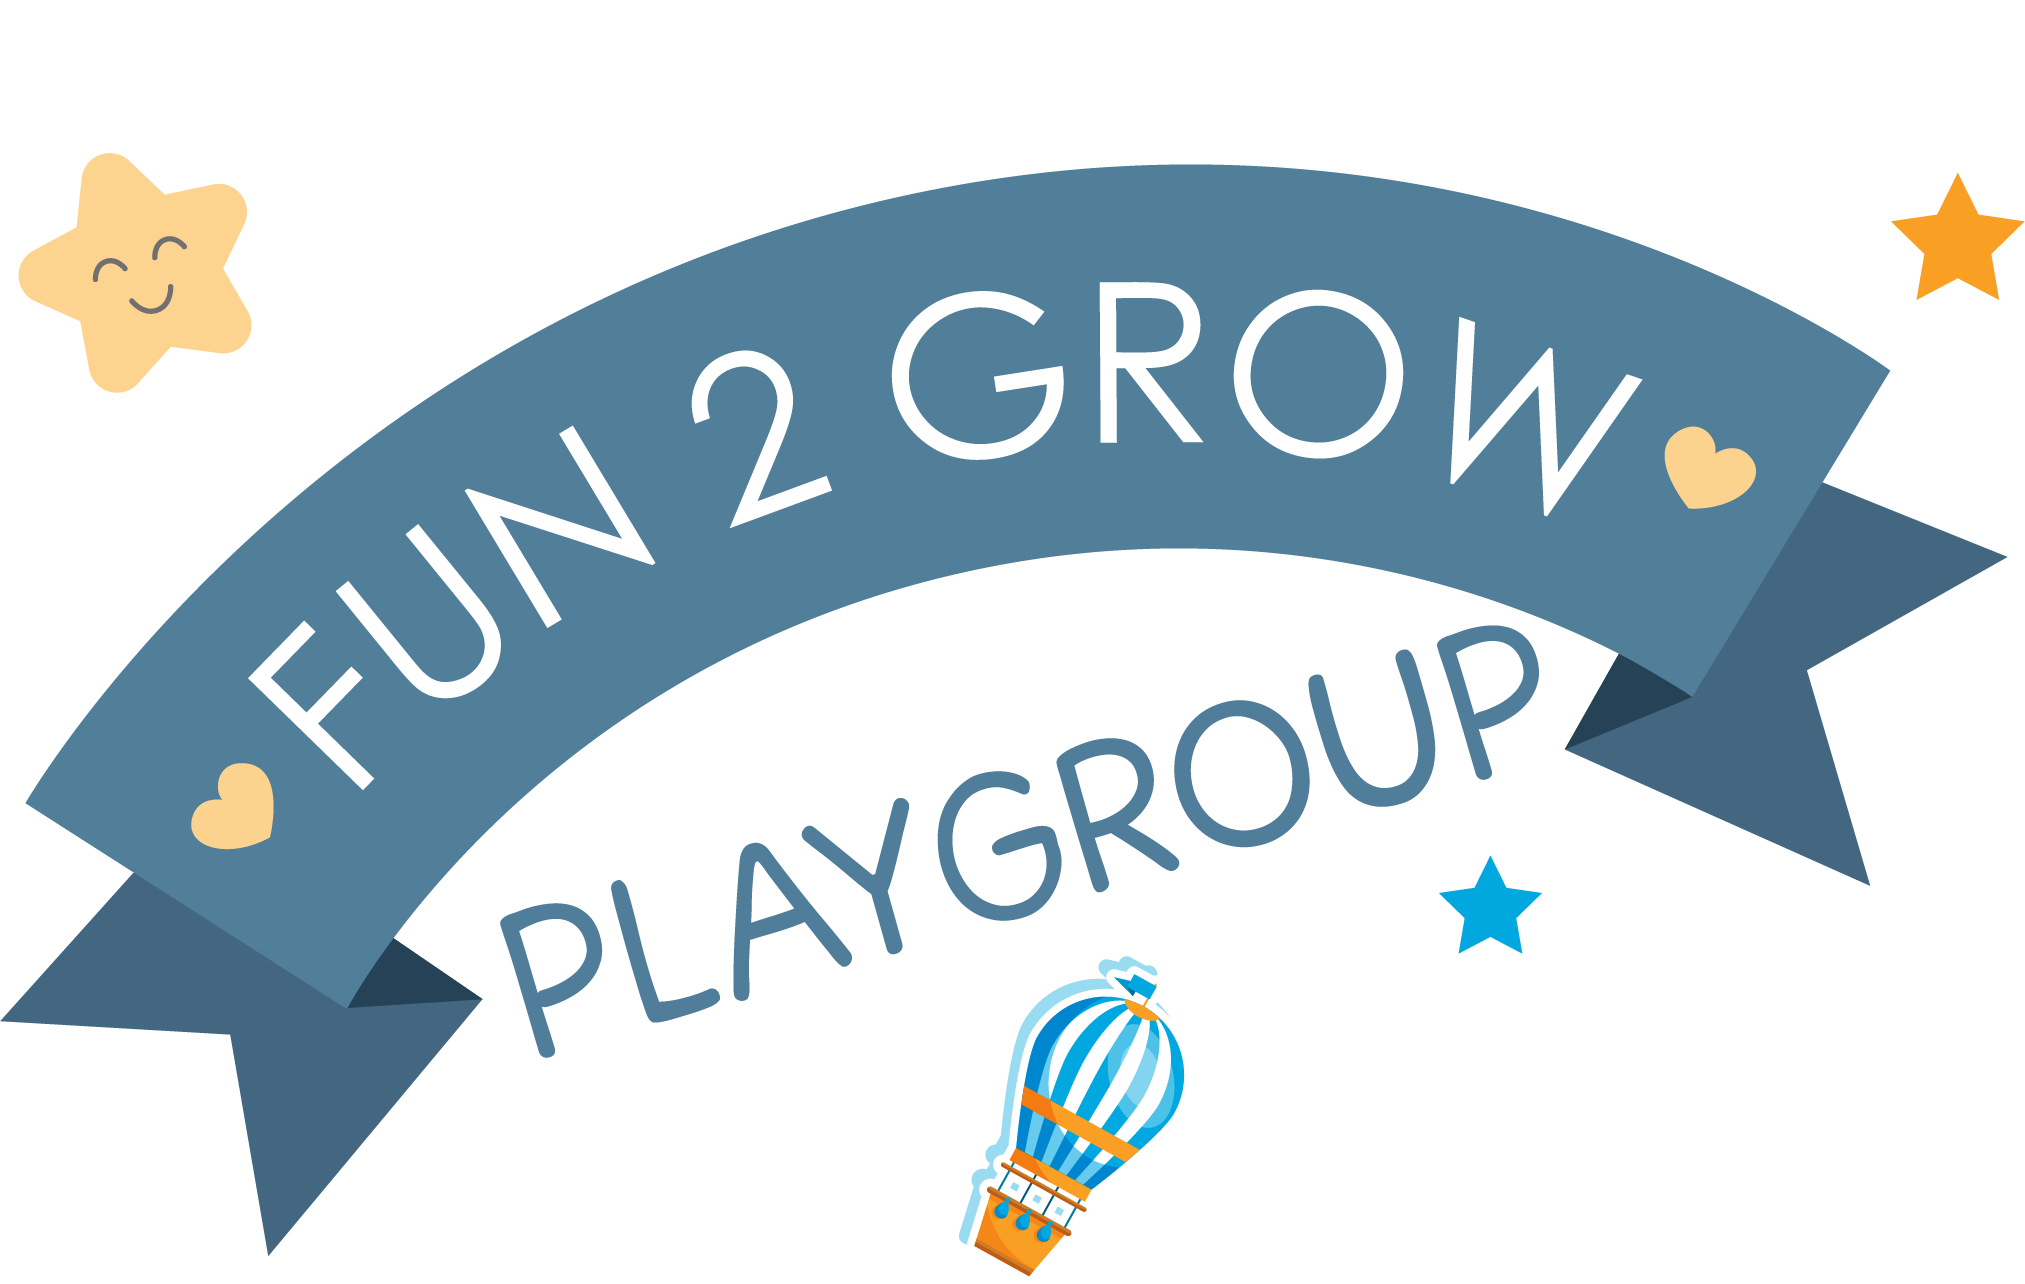 Fun 2 Grow – Playgroup